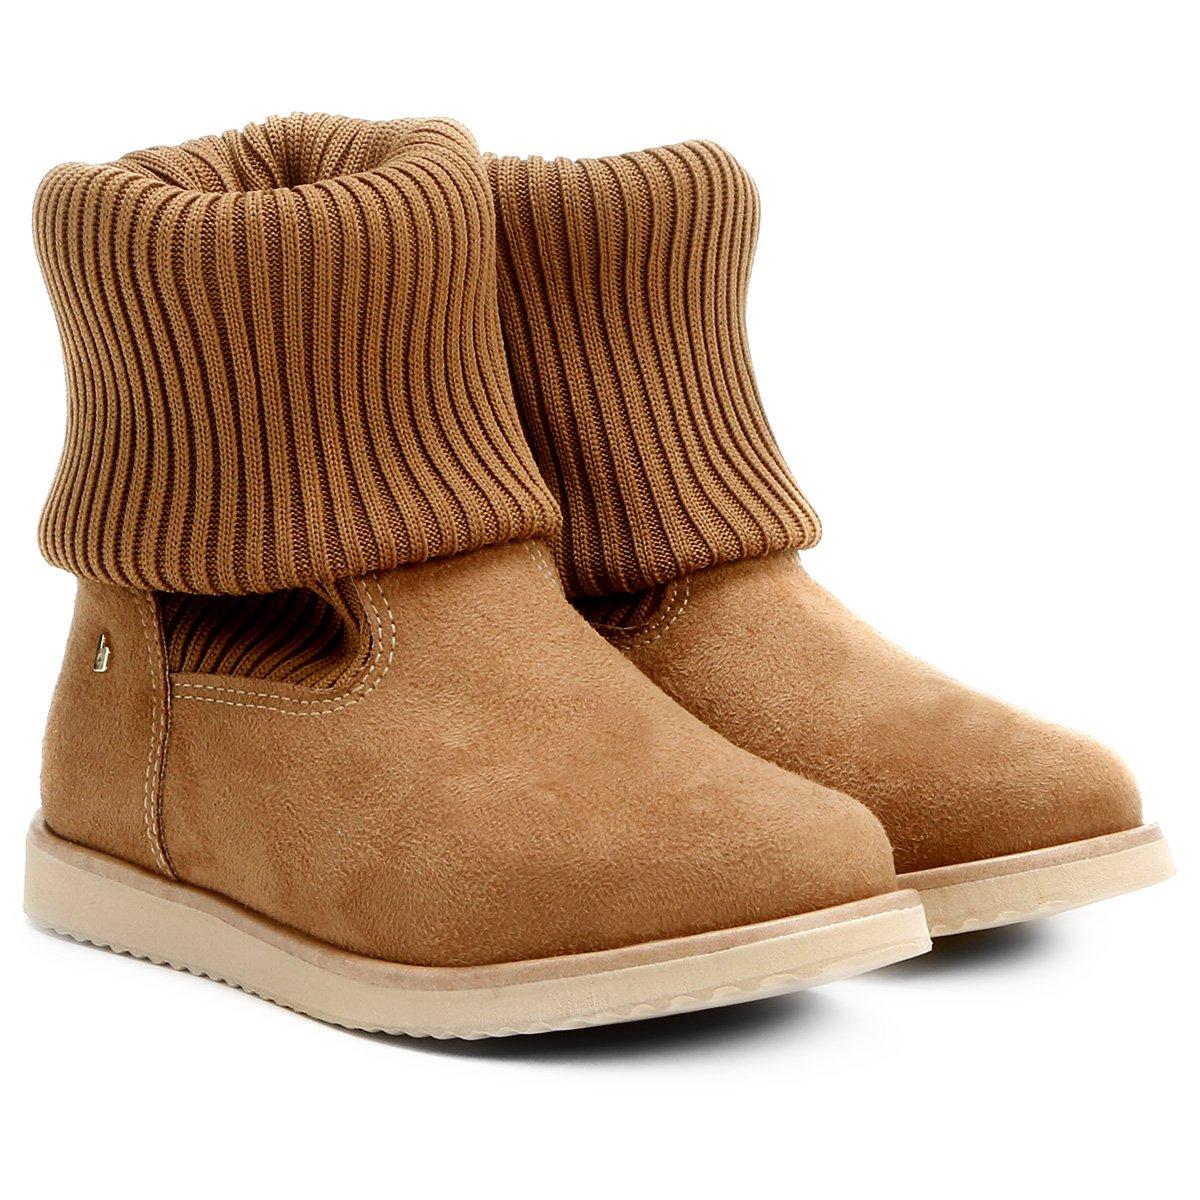 4112db53a8 Bota Infantil Cano Curto Bibi Frozen Boots Feminina - Compre Agora ...